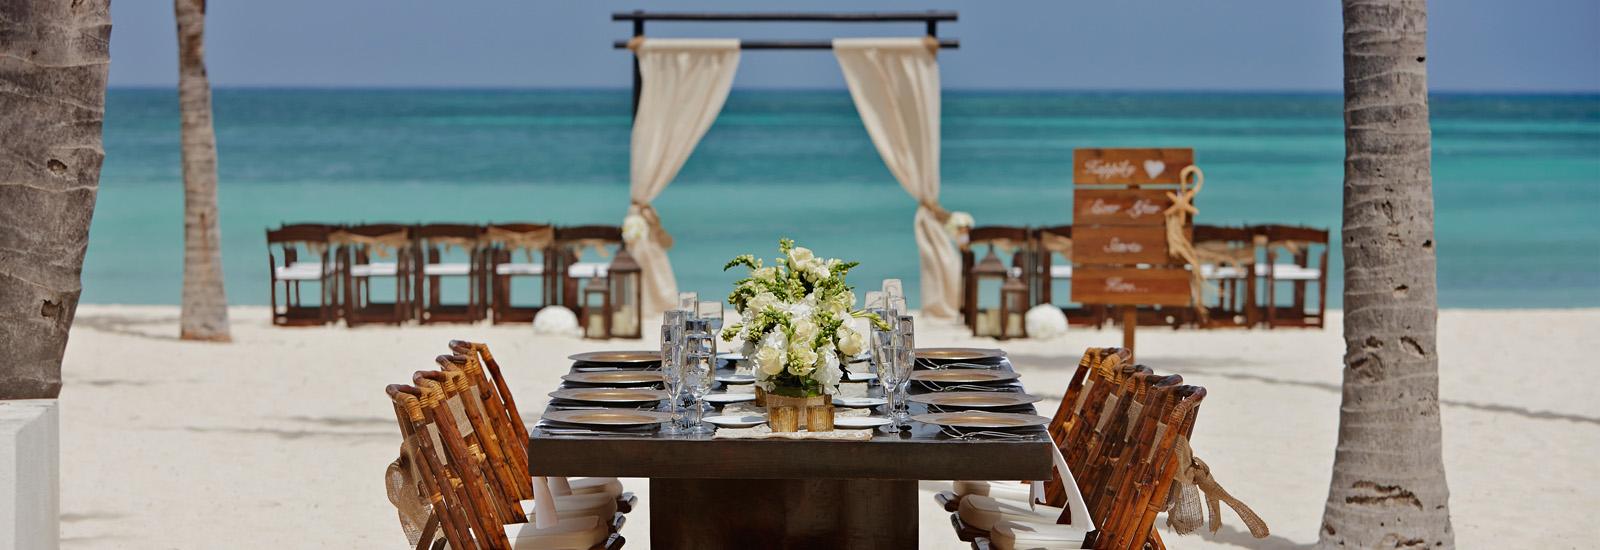 Marriott Aruba Surf Club | Aruba All Inclusive Resorts